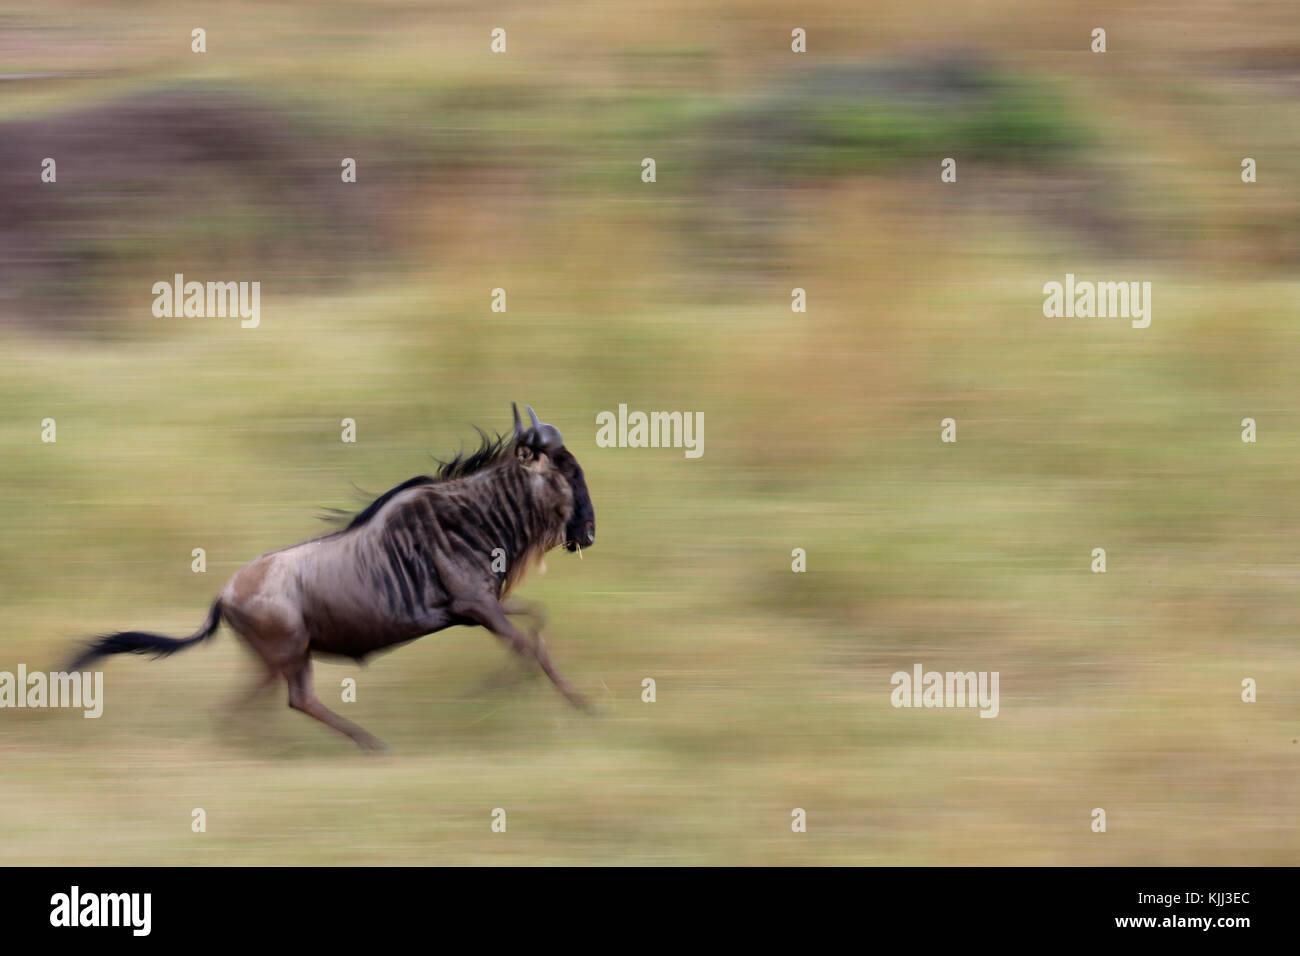 Motion blur of a running wildebeest  (Connochaetes taurinus) in tall grass. Masai Mara game reserve. Kenya. Stock Photo